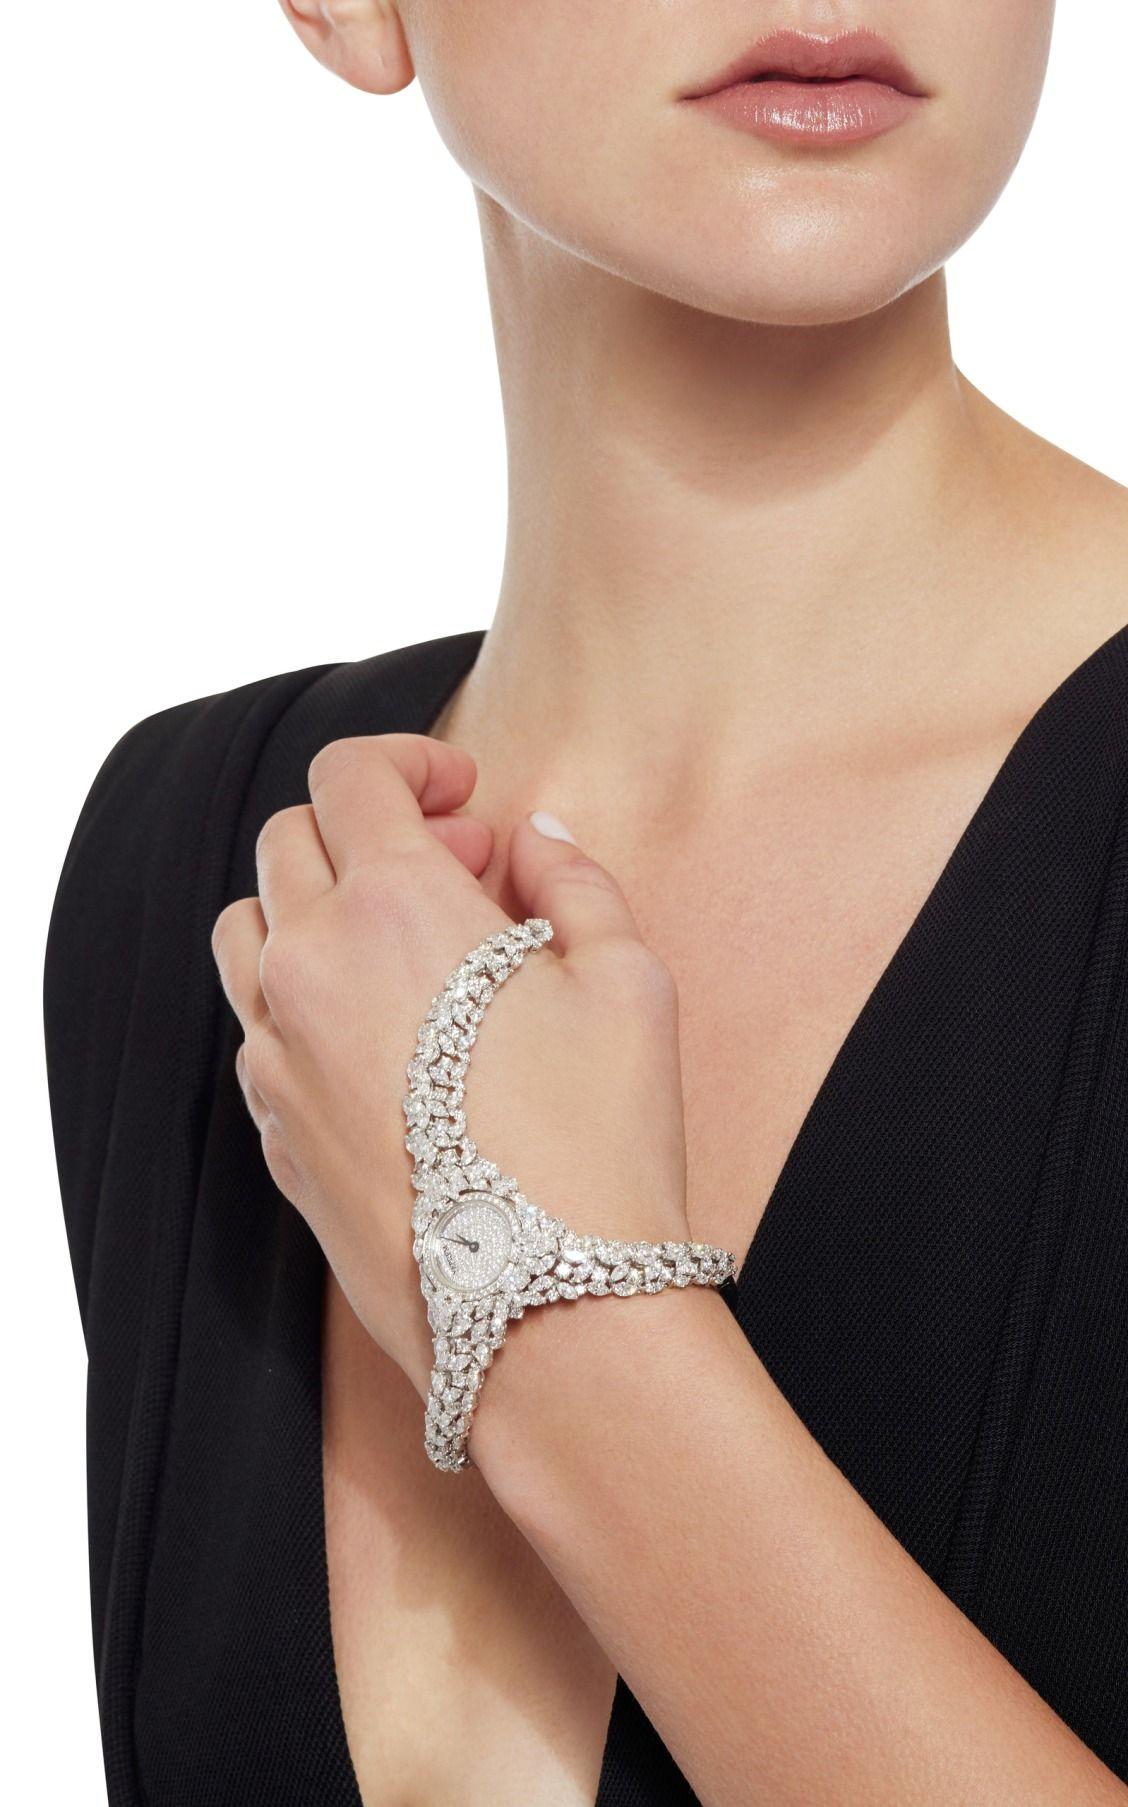 Yeprem 18K White Gold Hand Piece with Round & Marquis Diamonds HEymchc